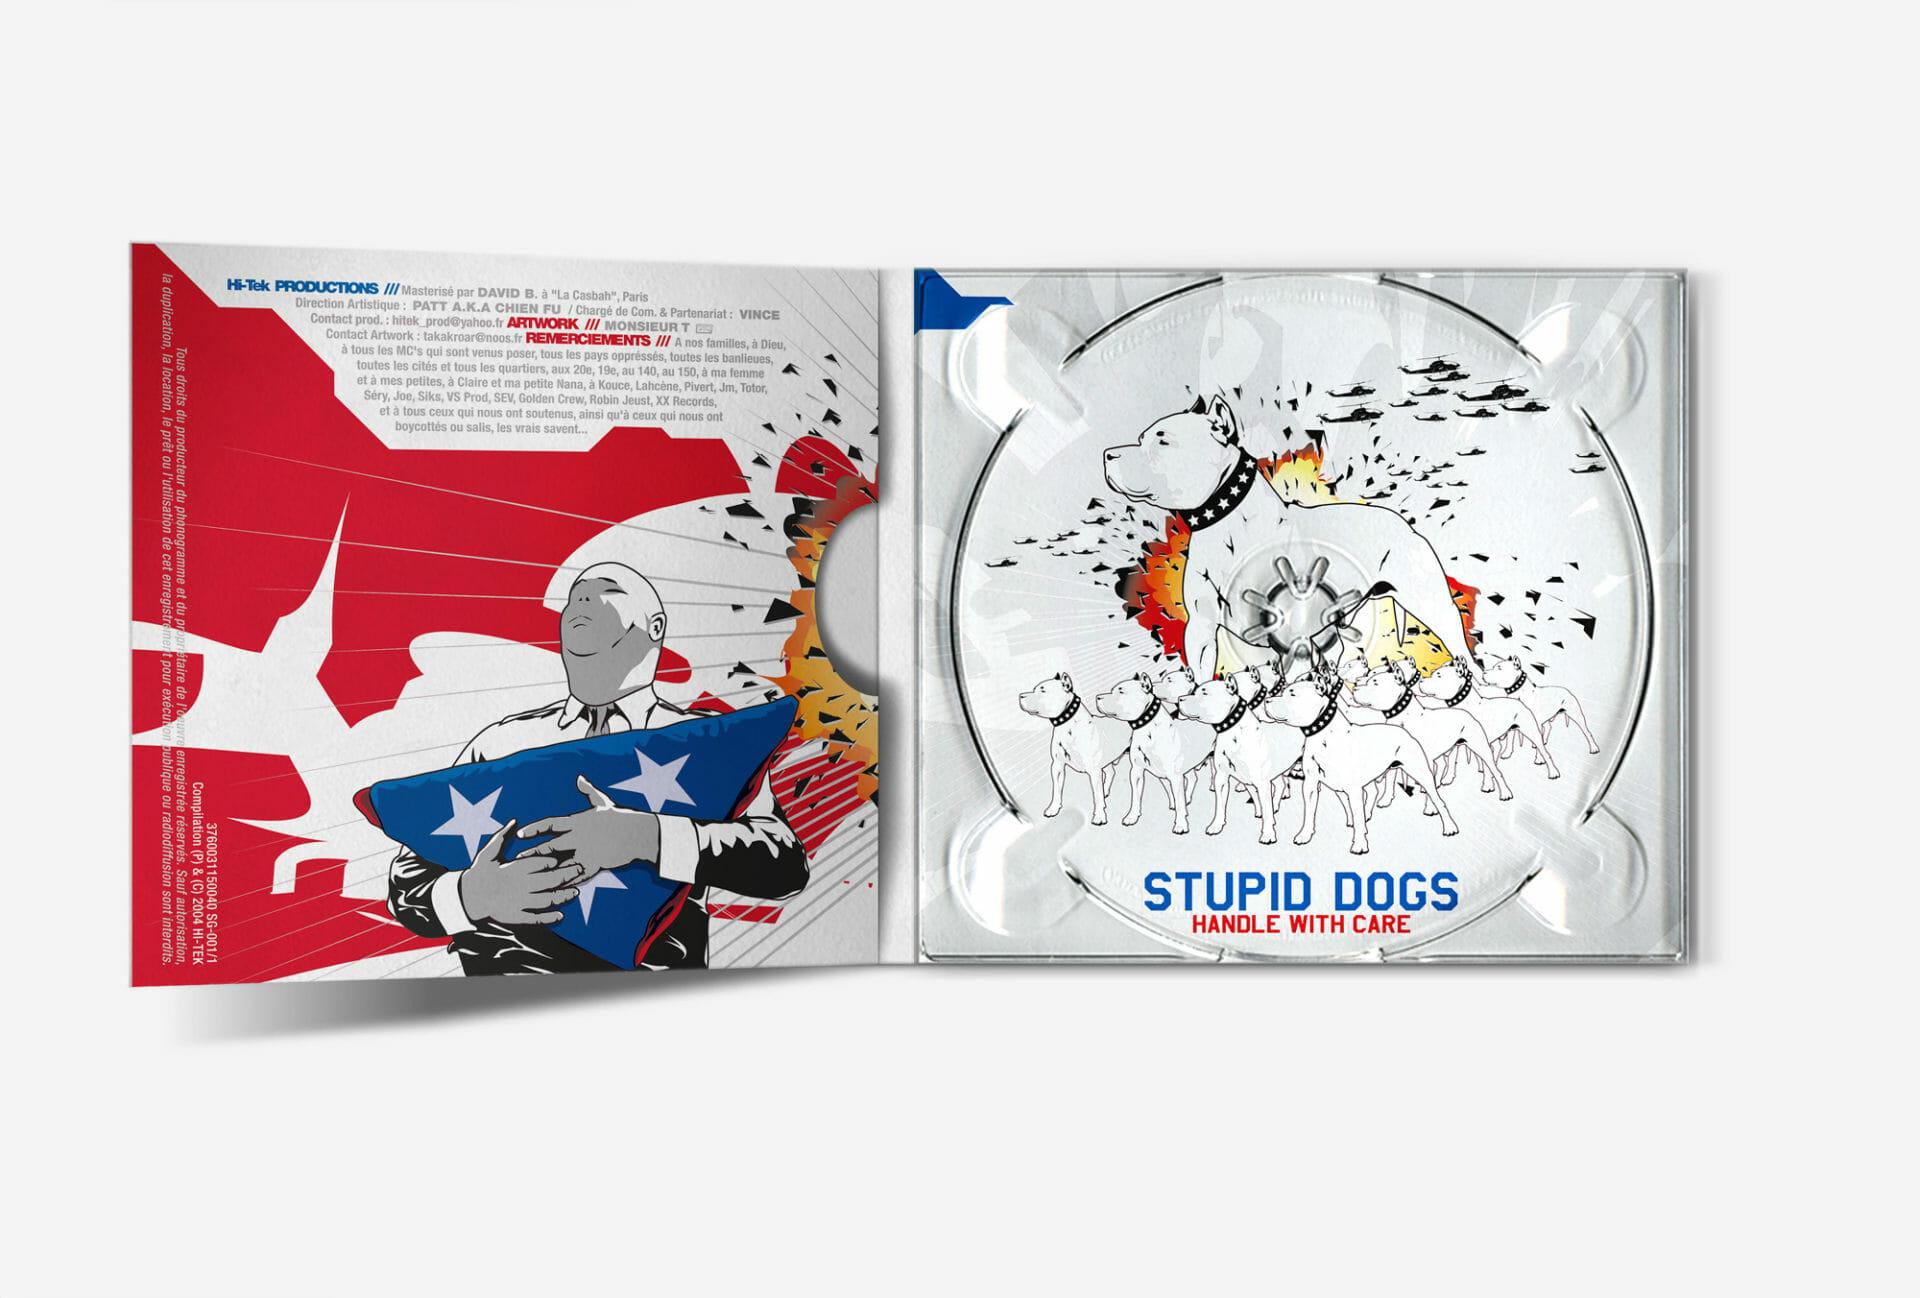 StupidGuerrier-book-cd-03